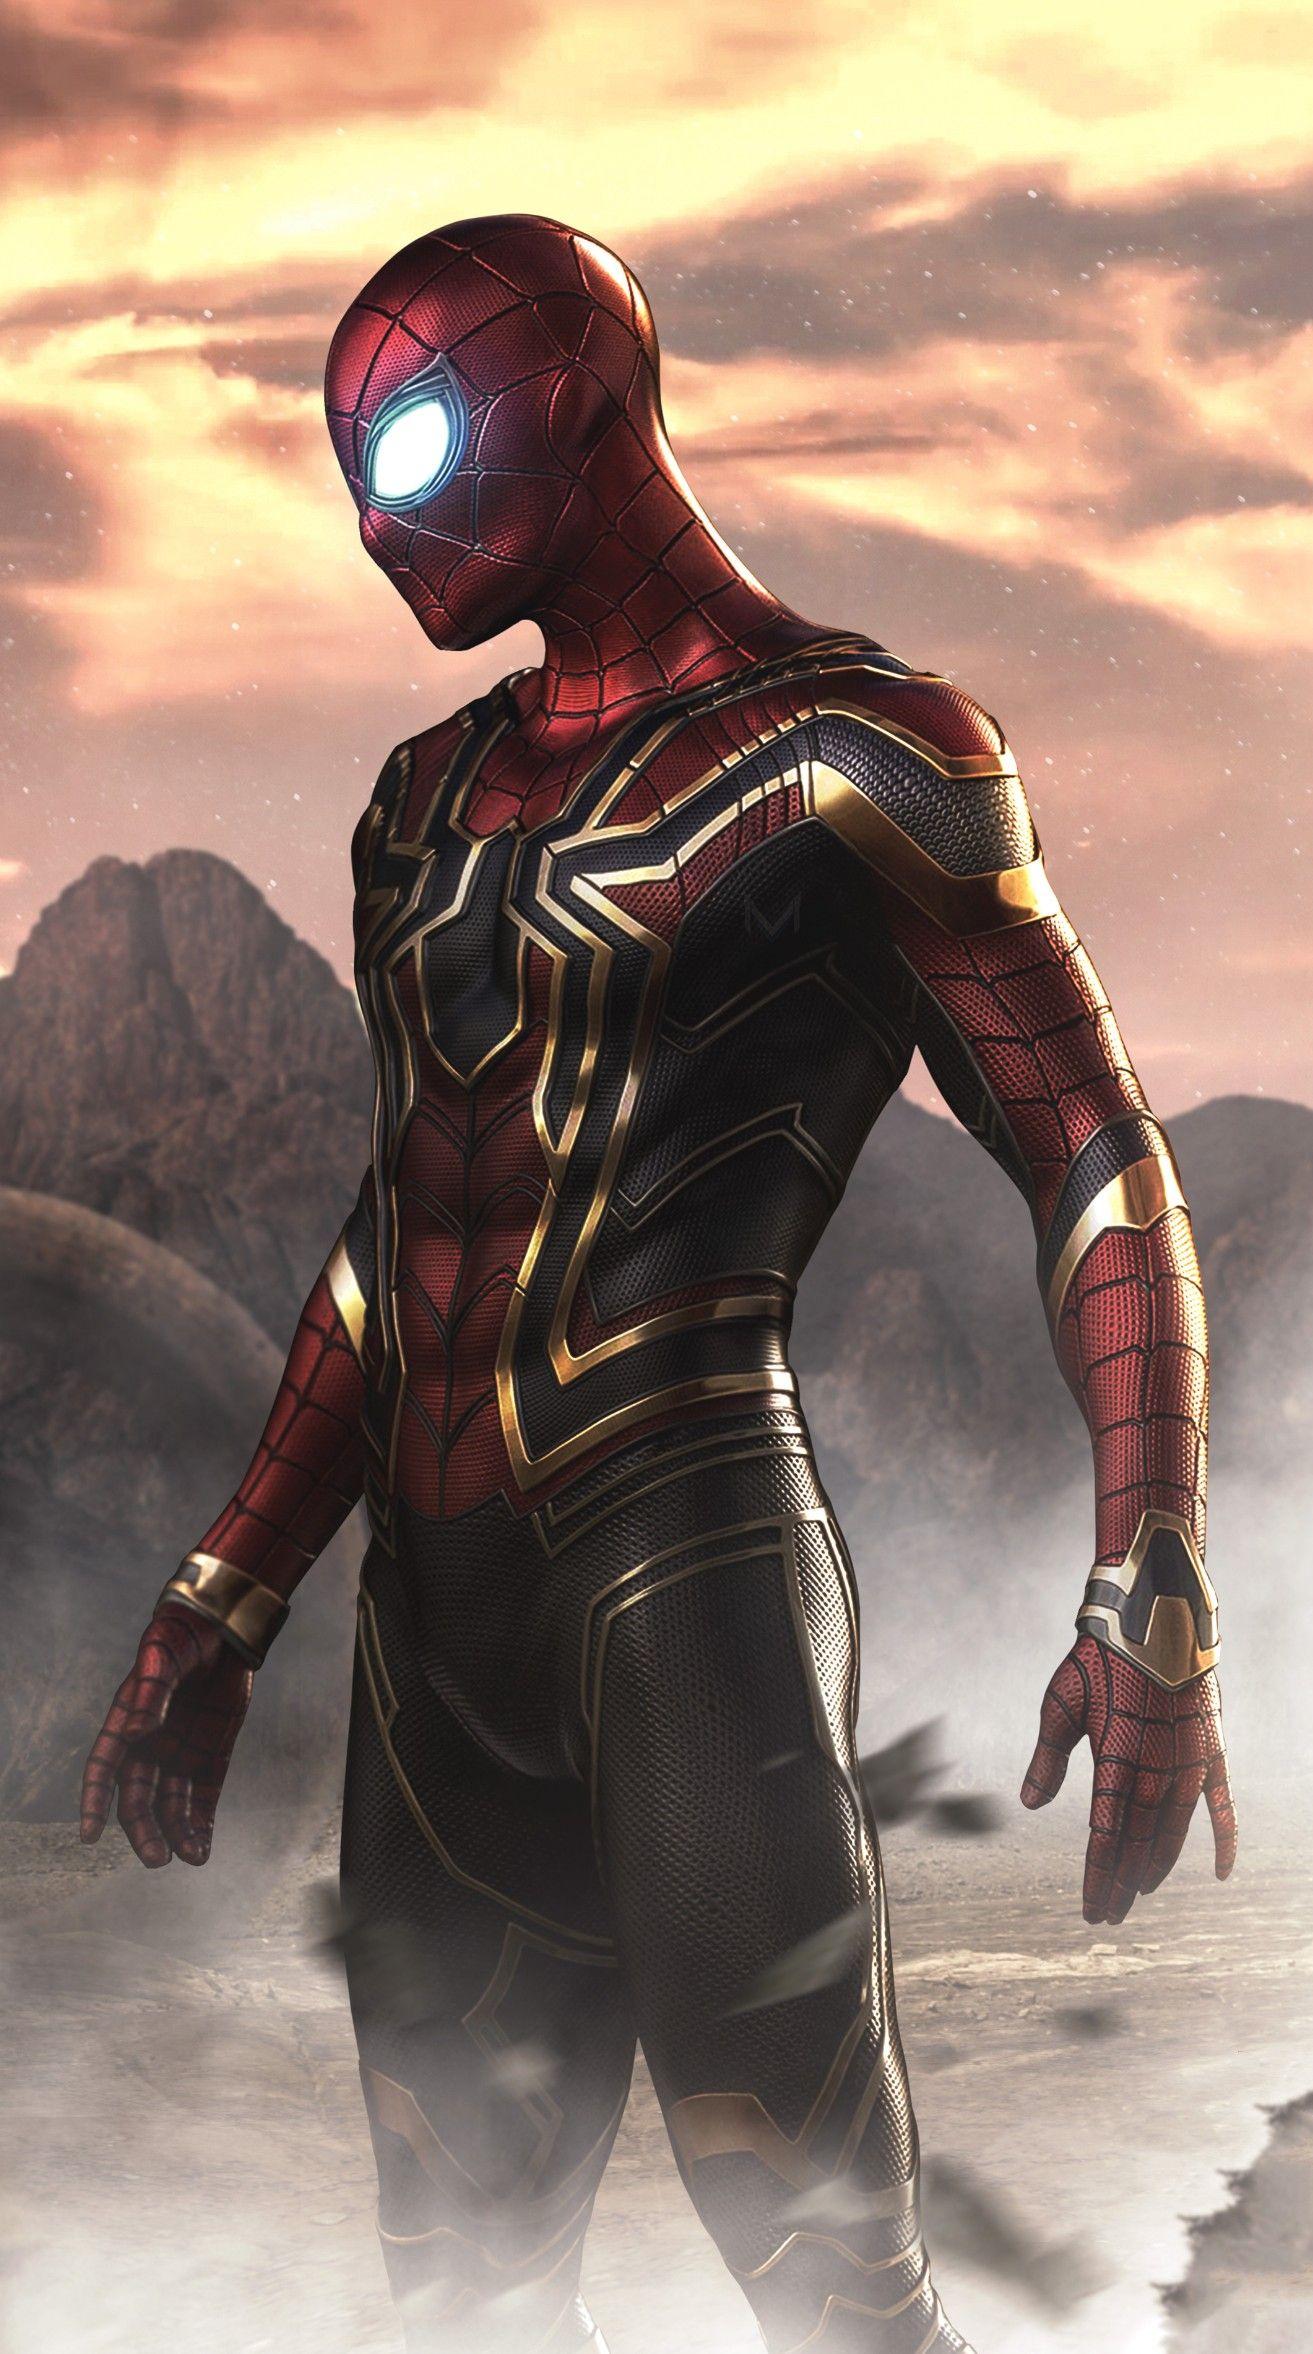 Iron Spider Man Spiderman Personajes Hombre Arana Comic Superheroes Marvel